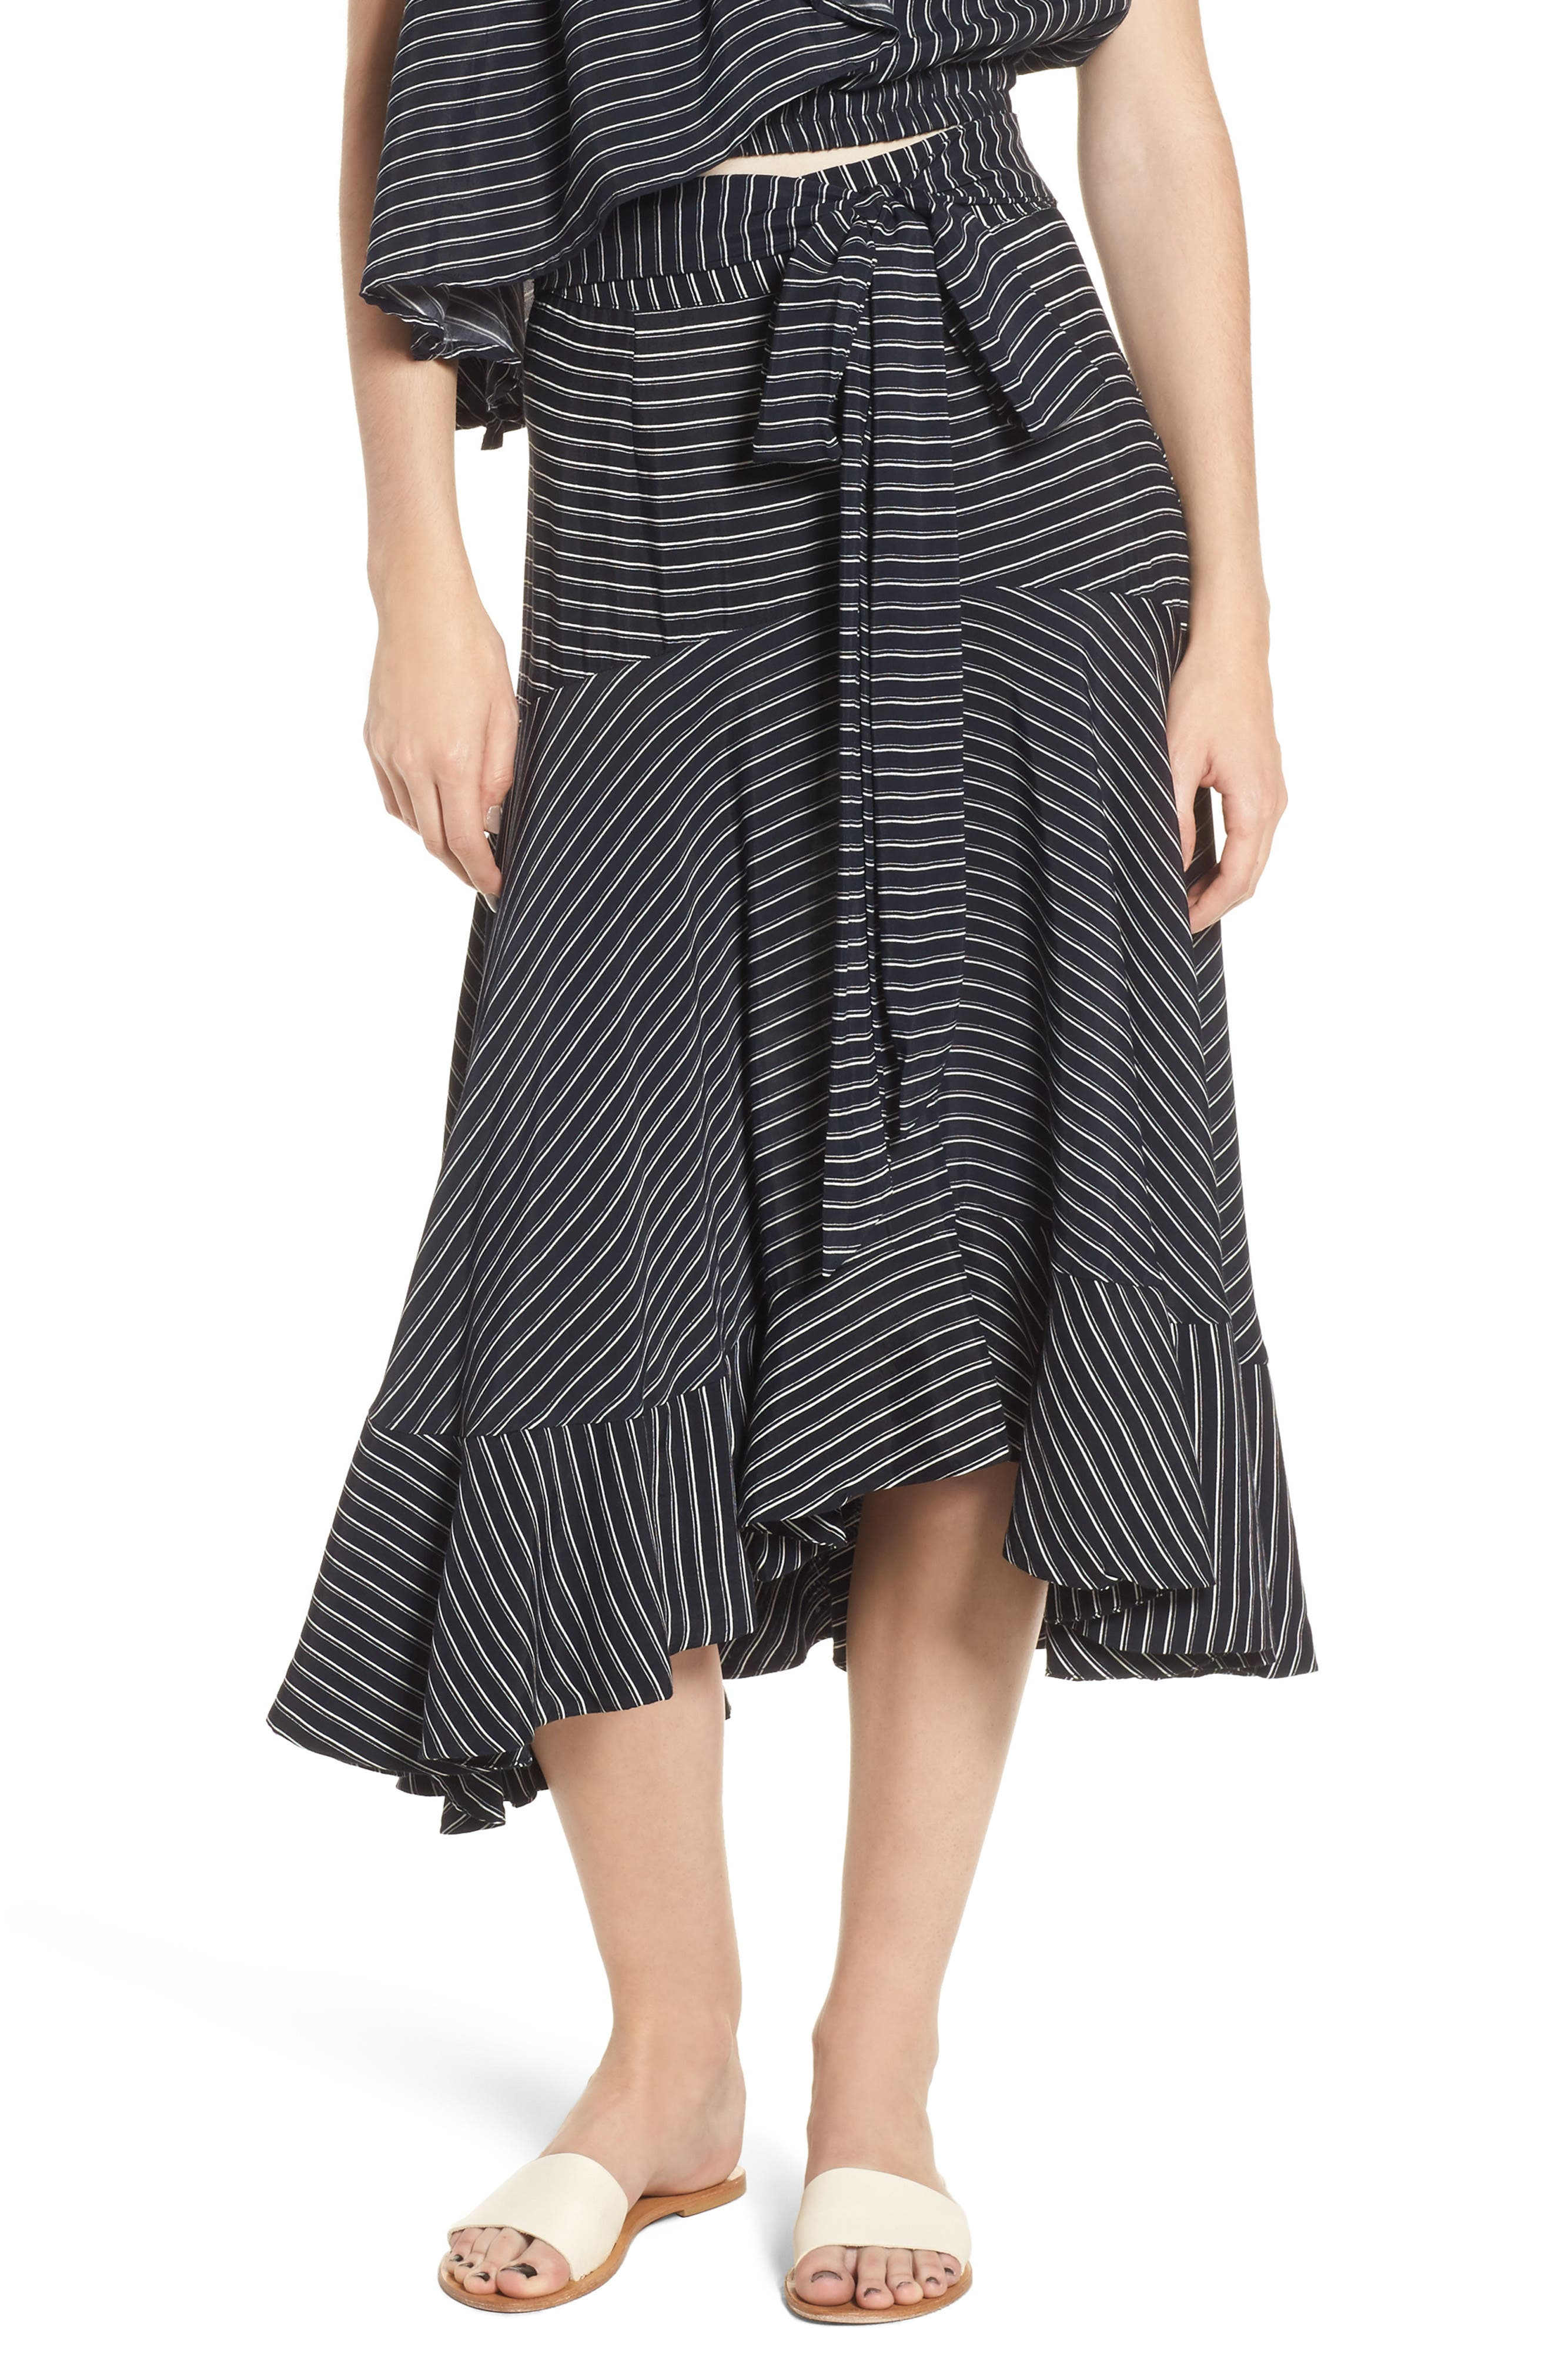 Kamares Ruffle Midi Skirt,                             Main thumbnail 1, color,                             001